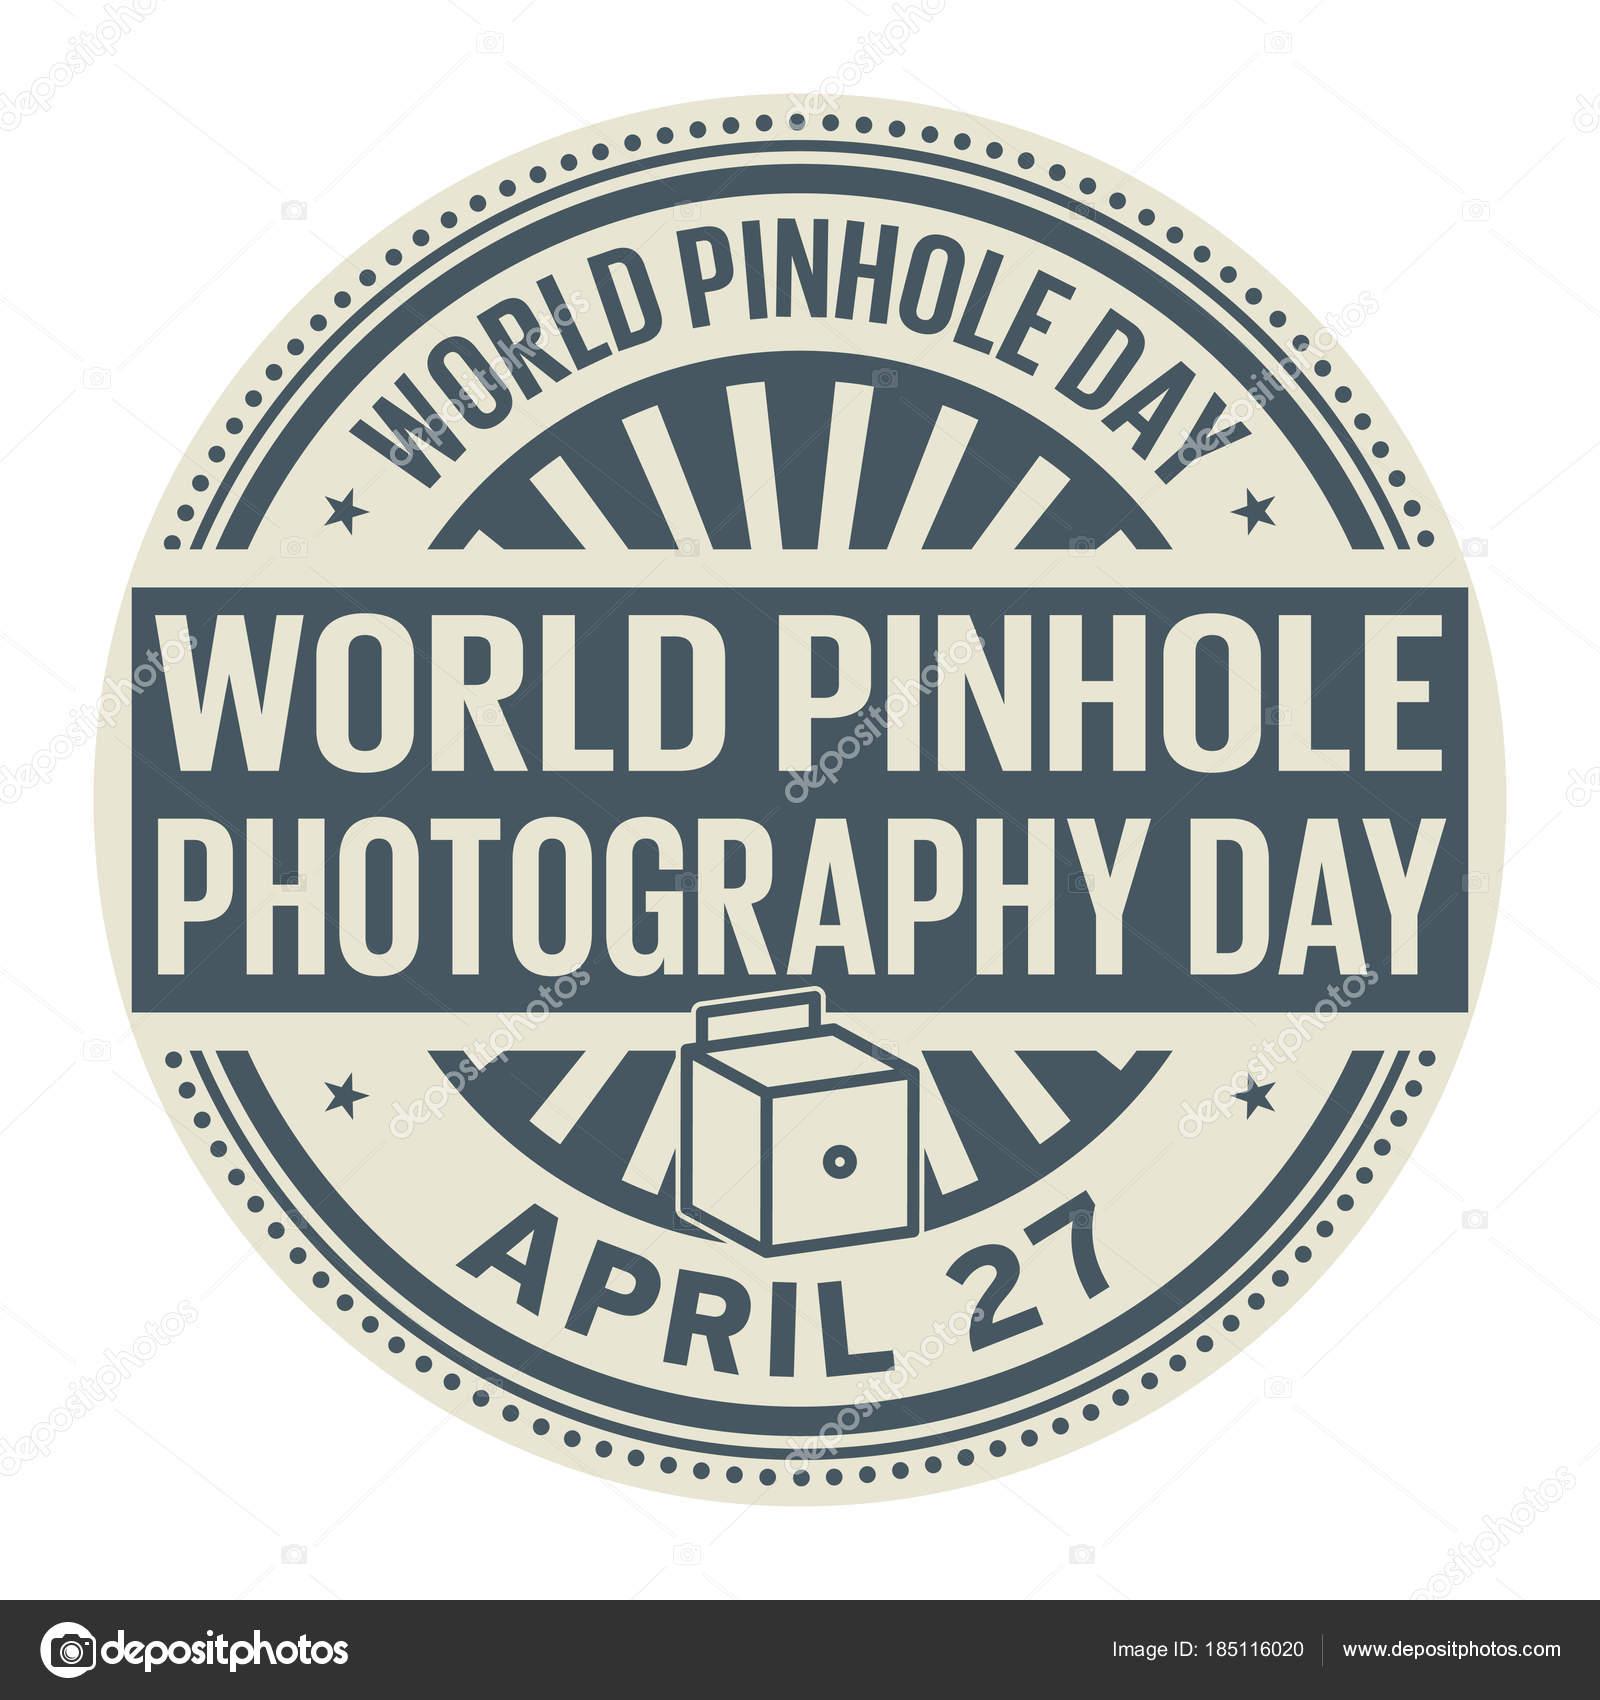 World Pinhole Photography Day Stock Vector